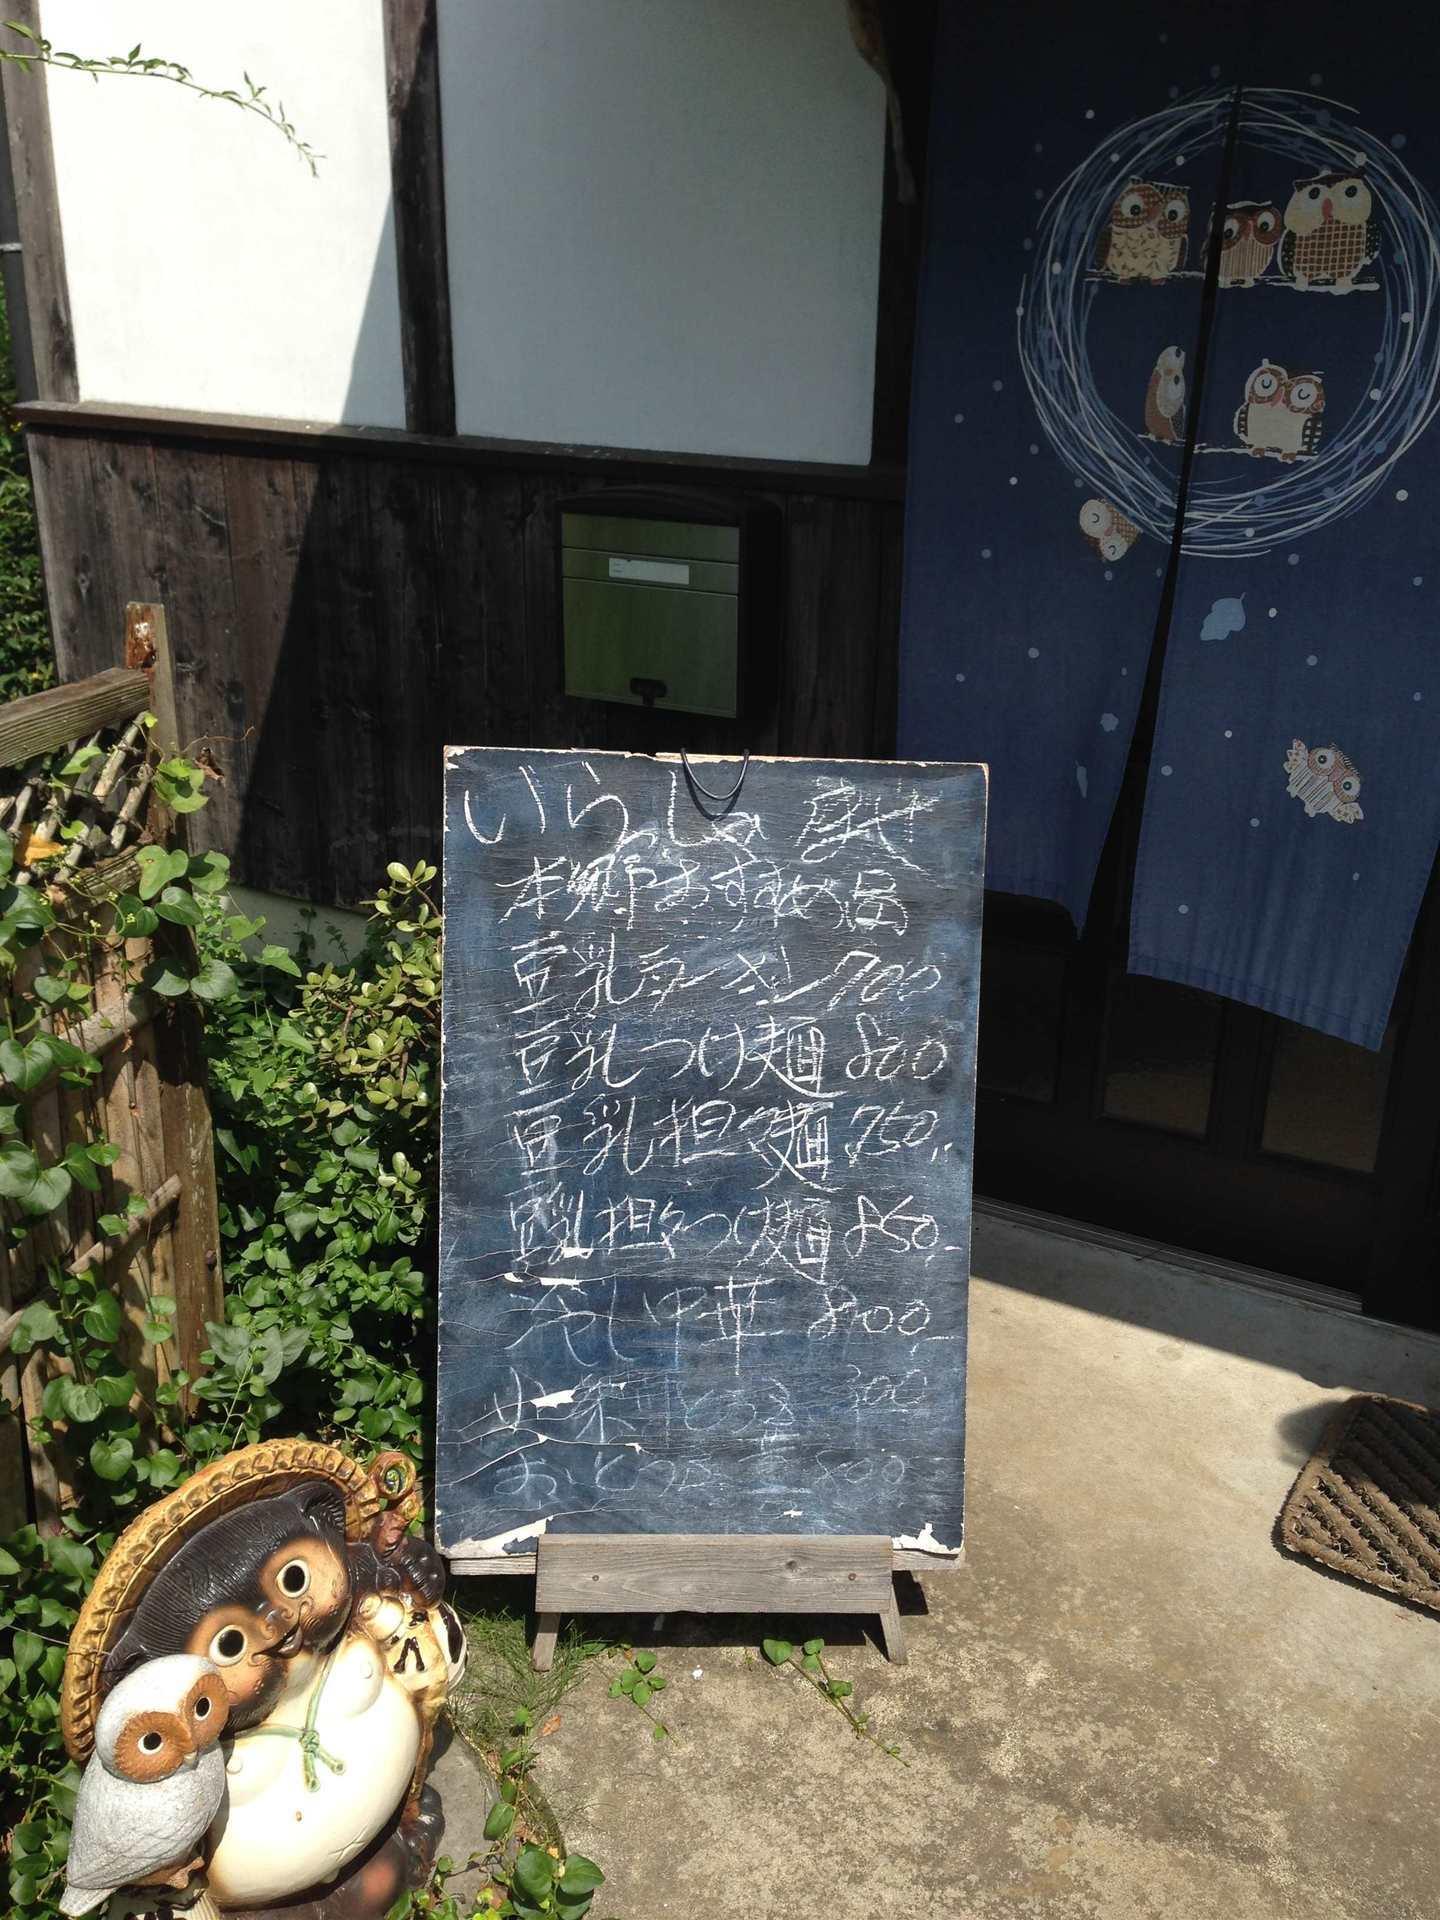 2015-08-15 13.29.14_R.jpg